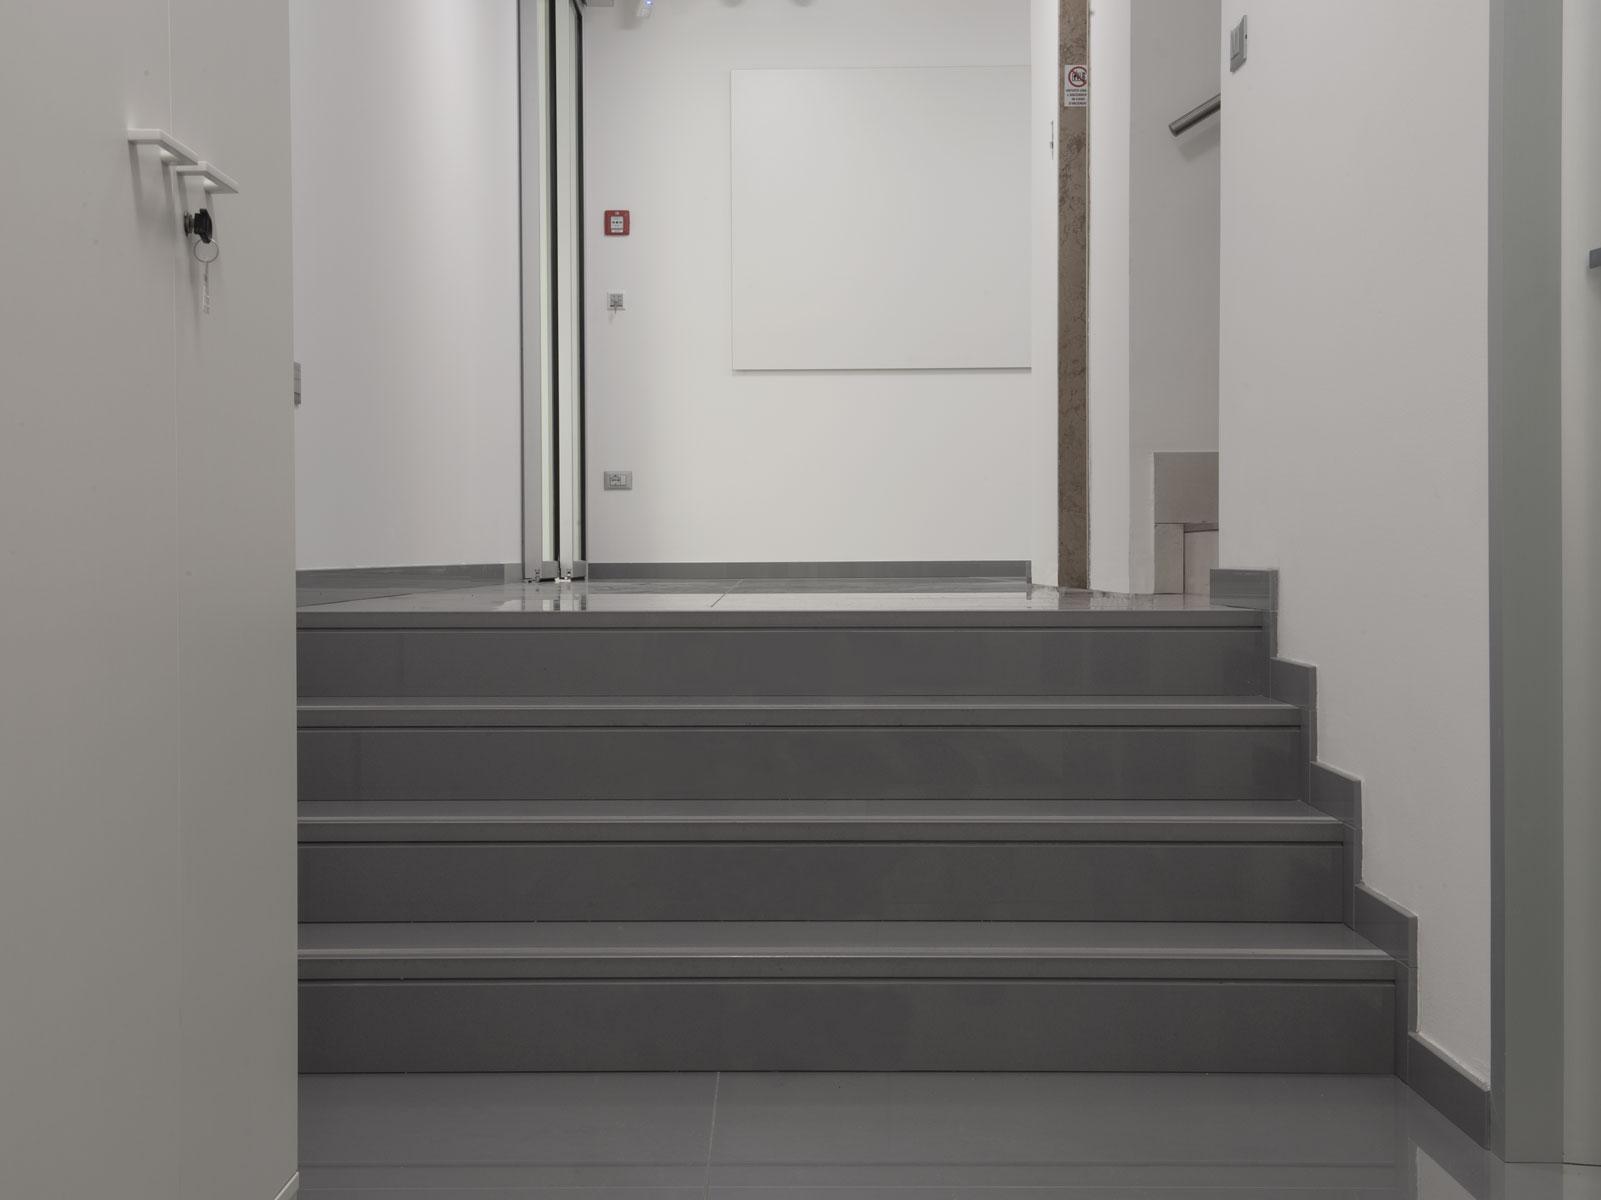 schody z kameňa sivé